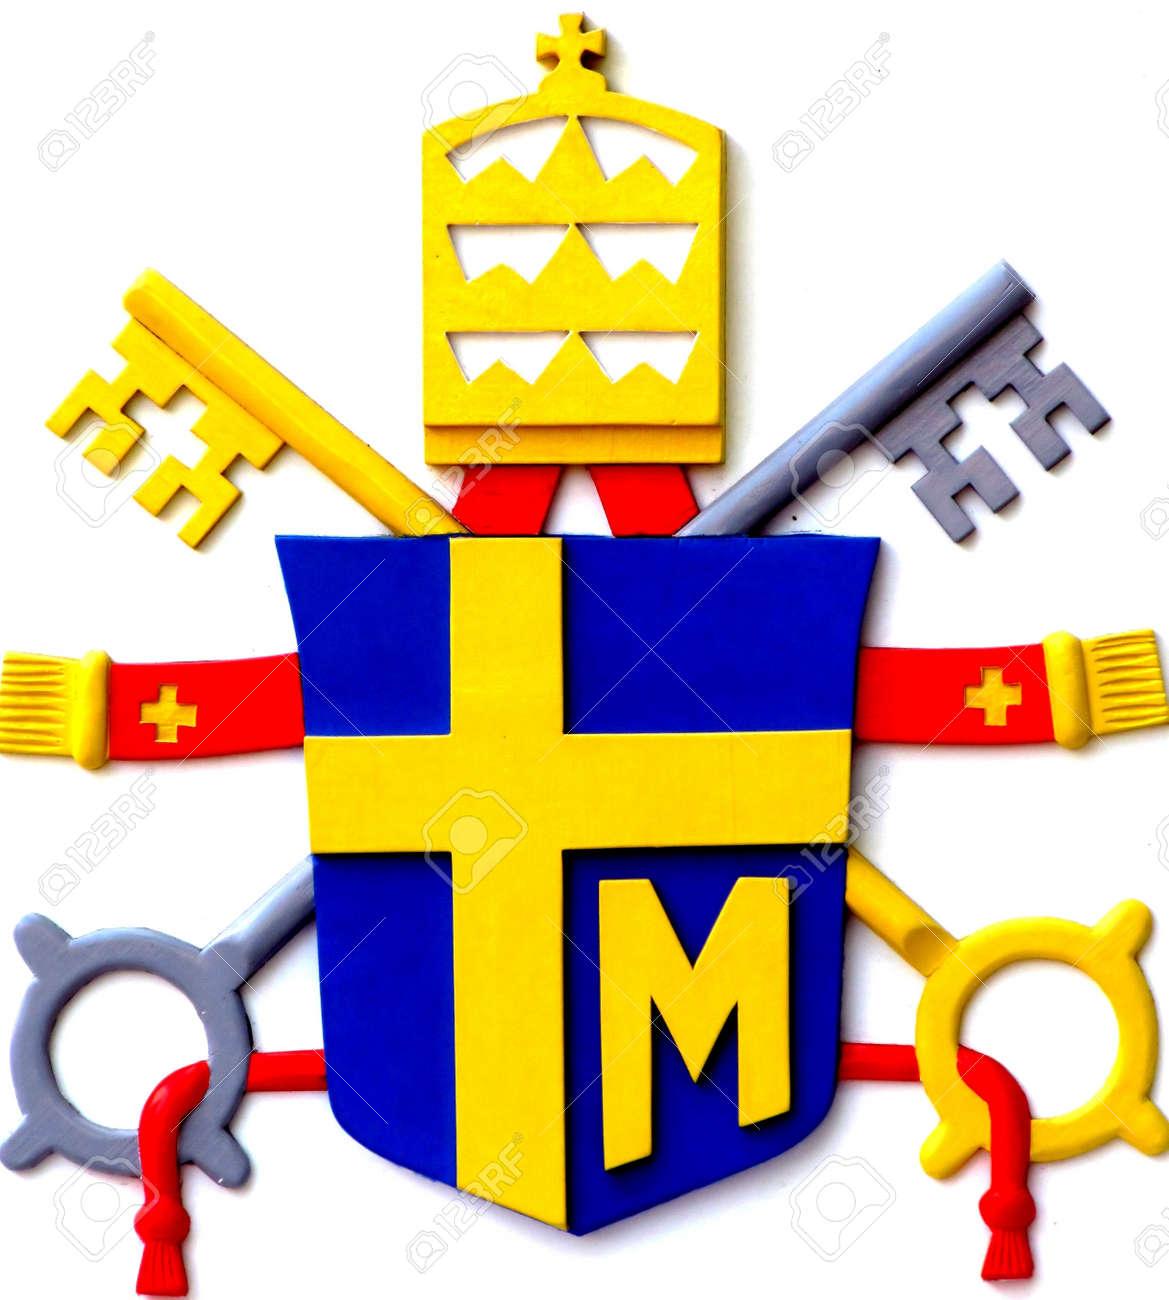 Pope john paul iis coat of arms stock photo picture and royalty pope john paul iis coat of arms stock photo 19993900 buycottarizona Choice Image